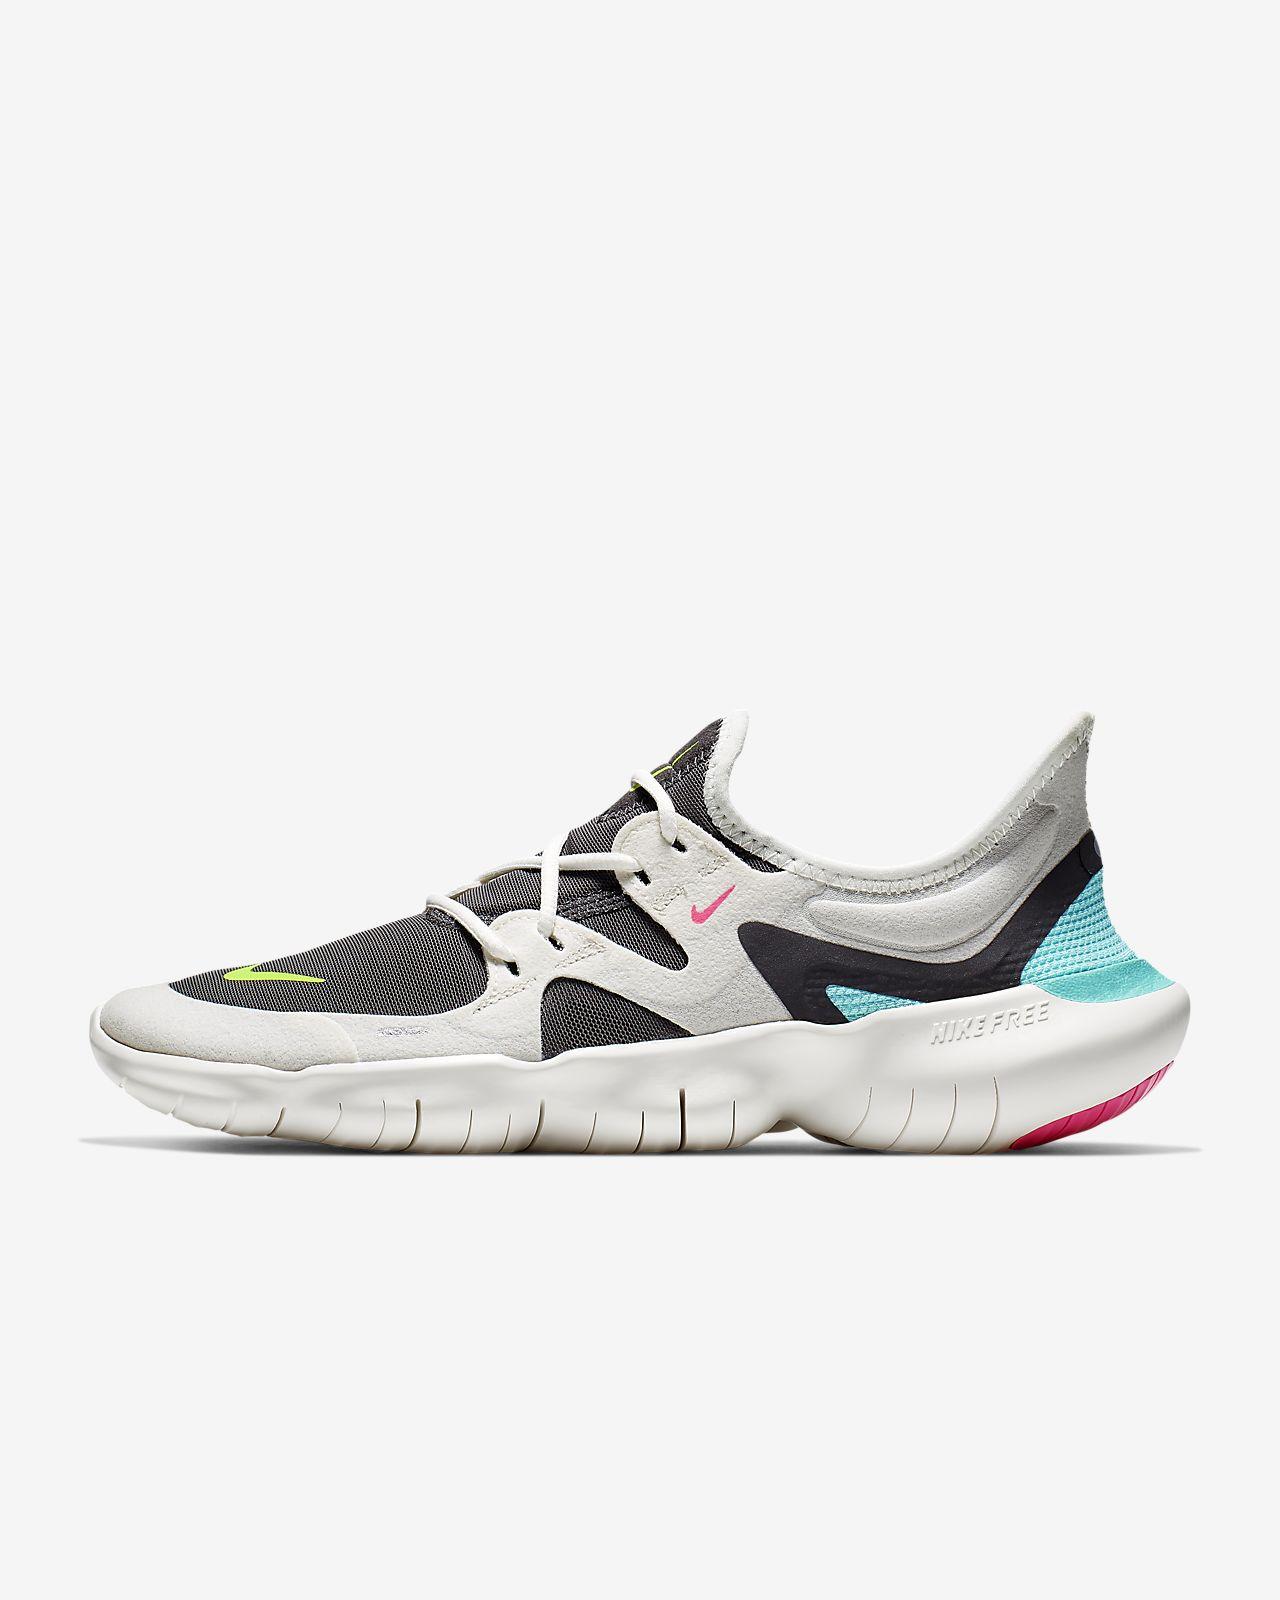 Nike Free RN 5.0 Damen Laufschuh. AT